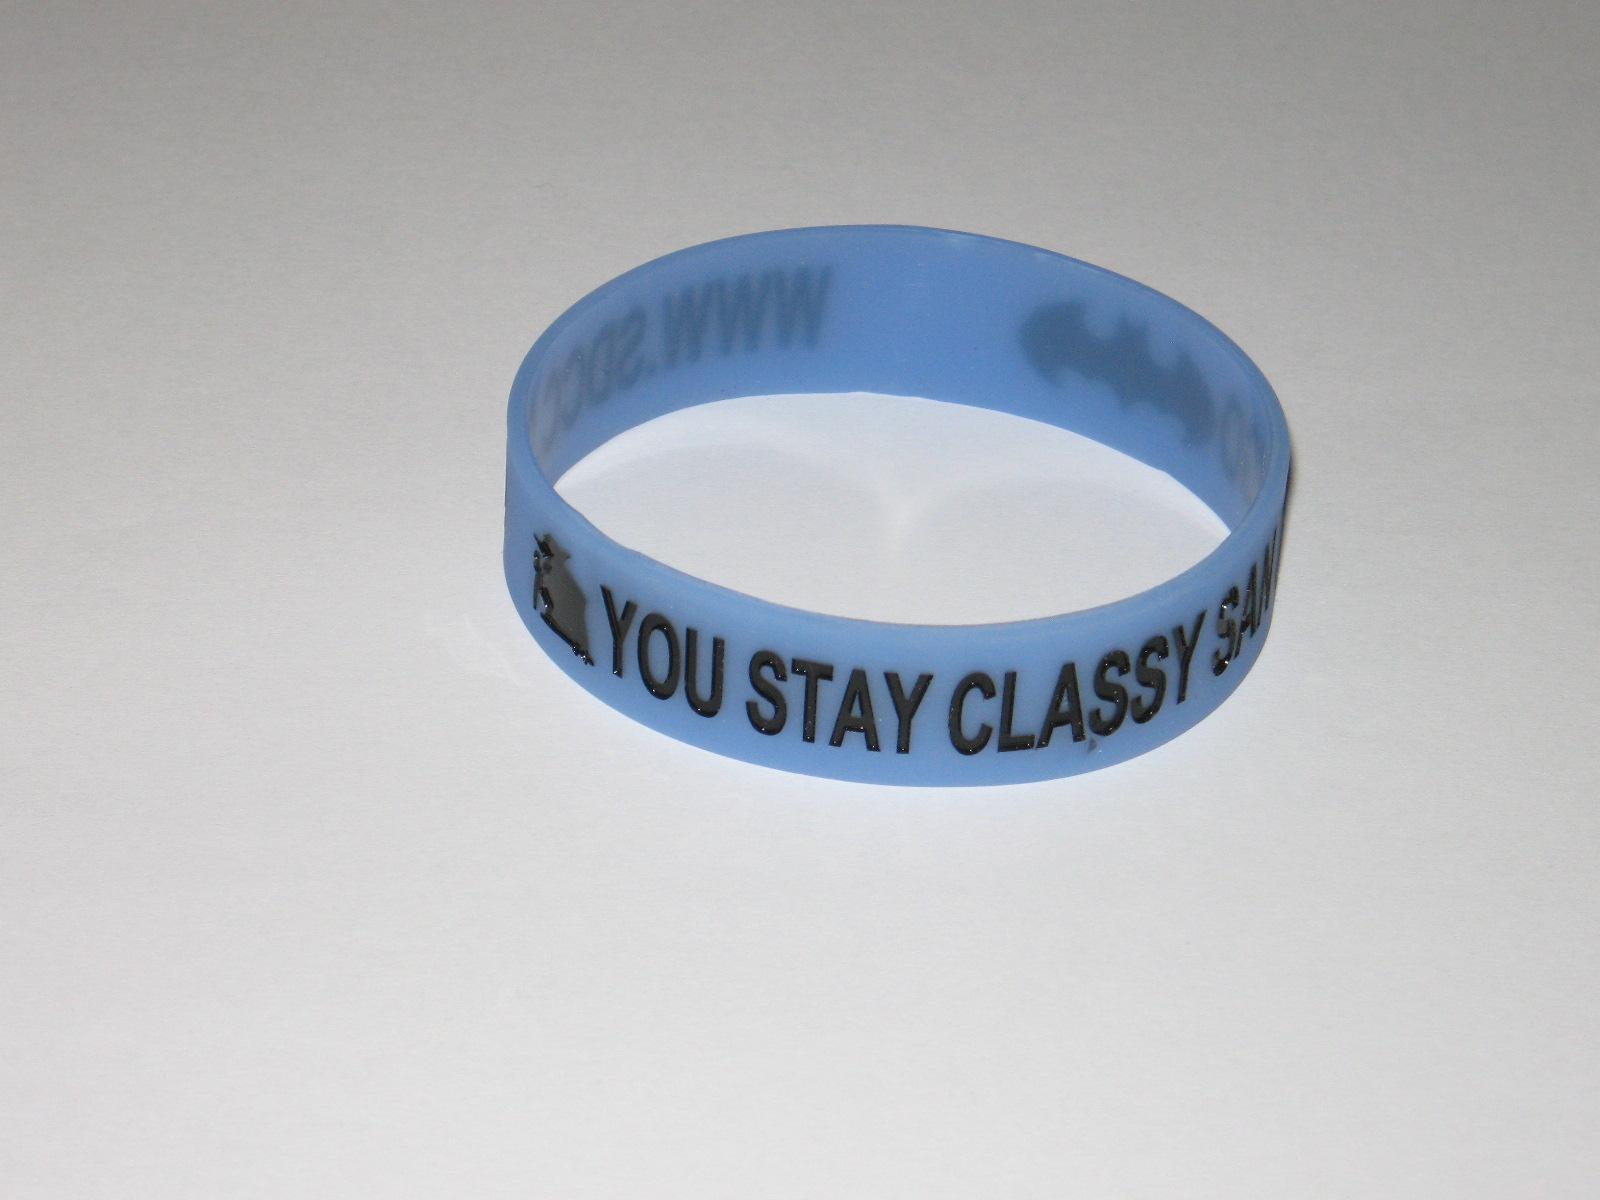 2014 SDCC Comic Con Wristband - Stay Classy San Diego